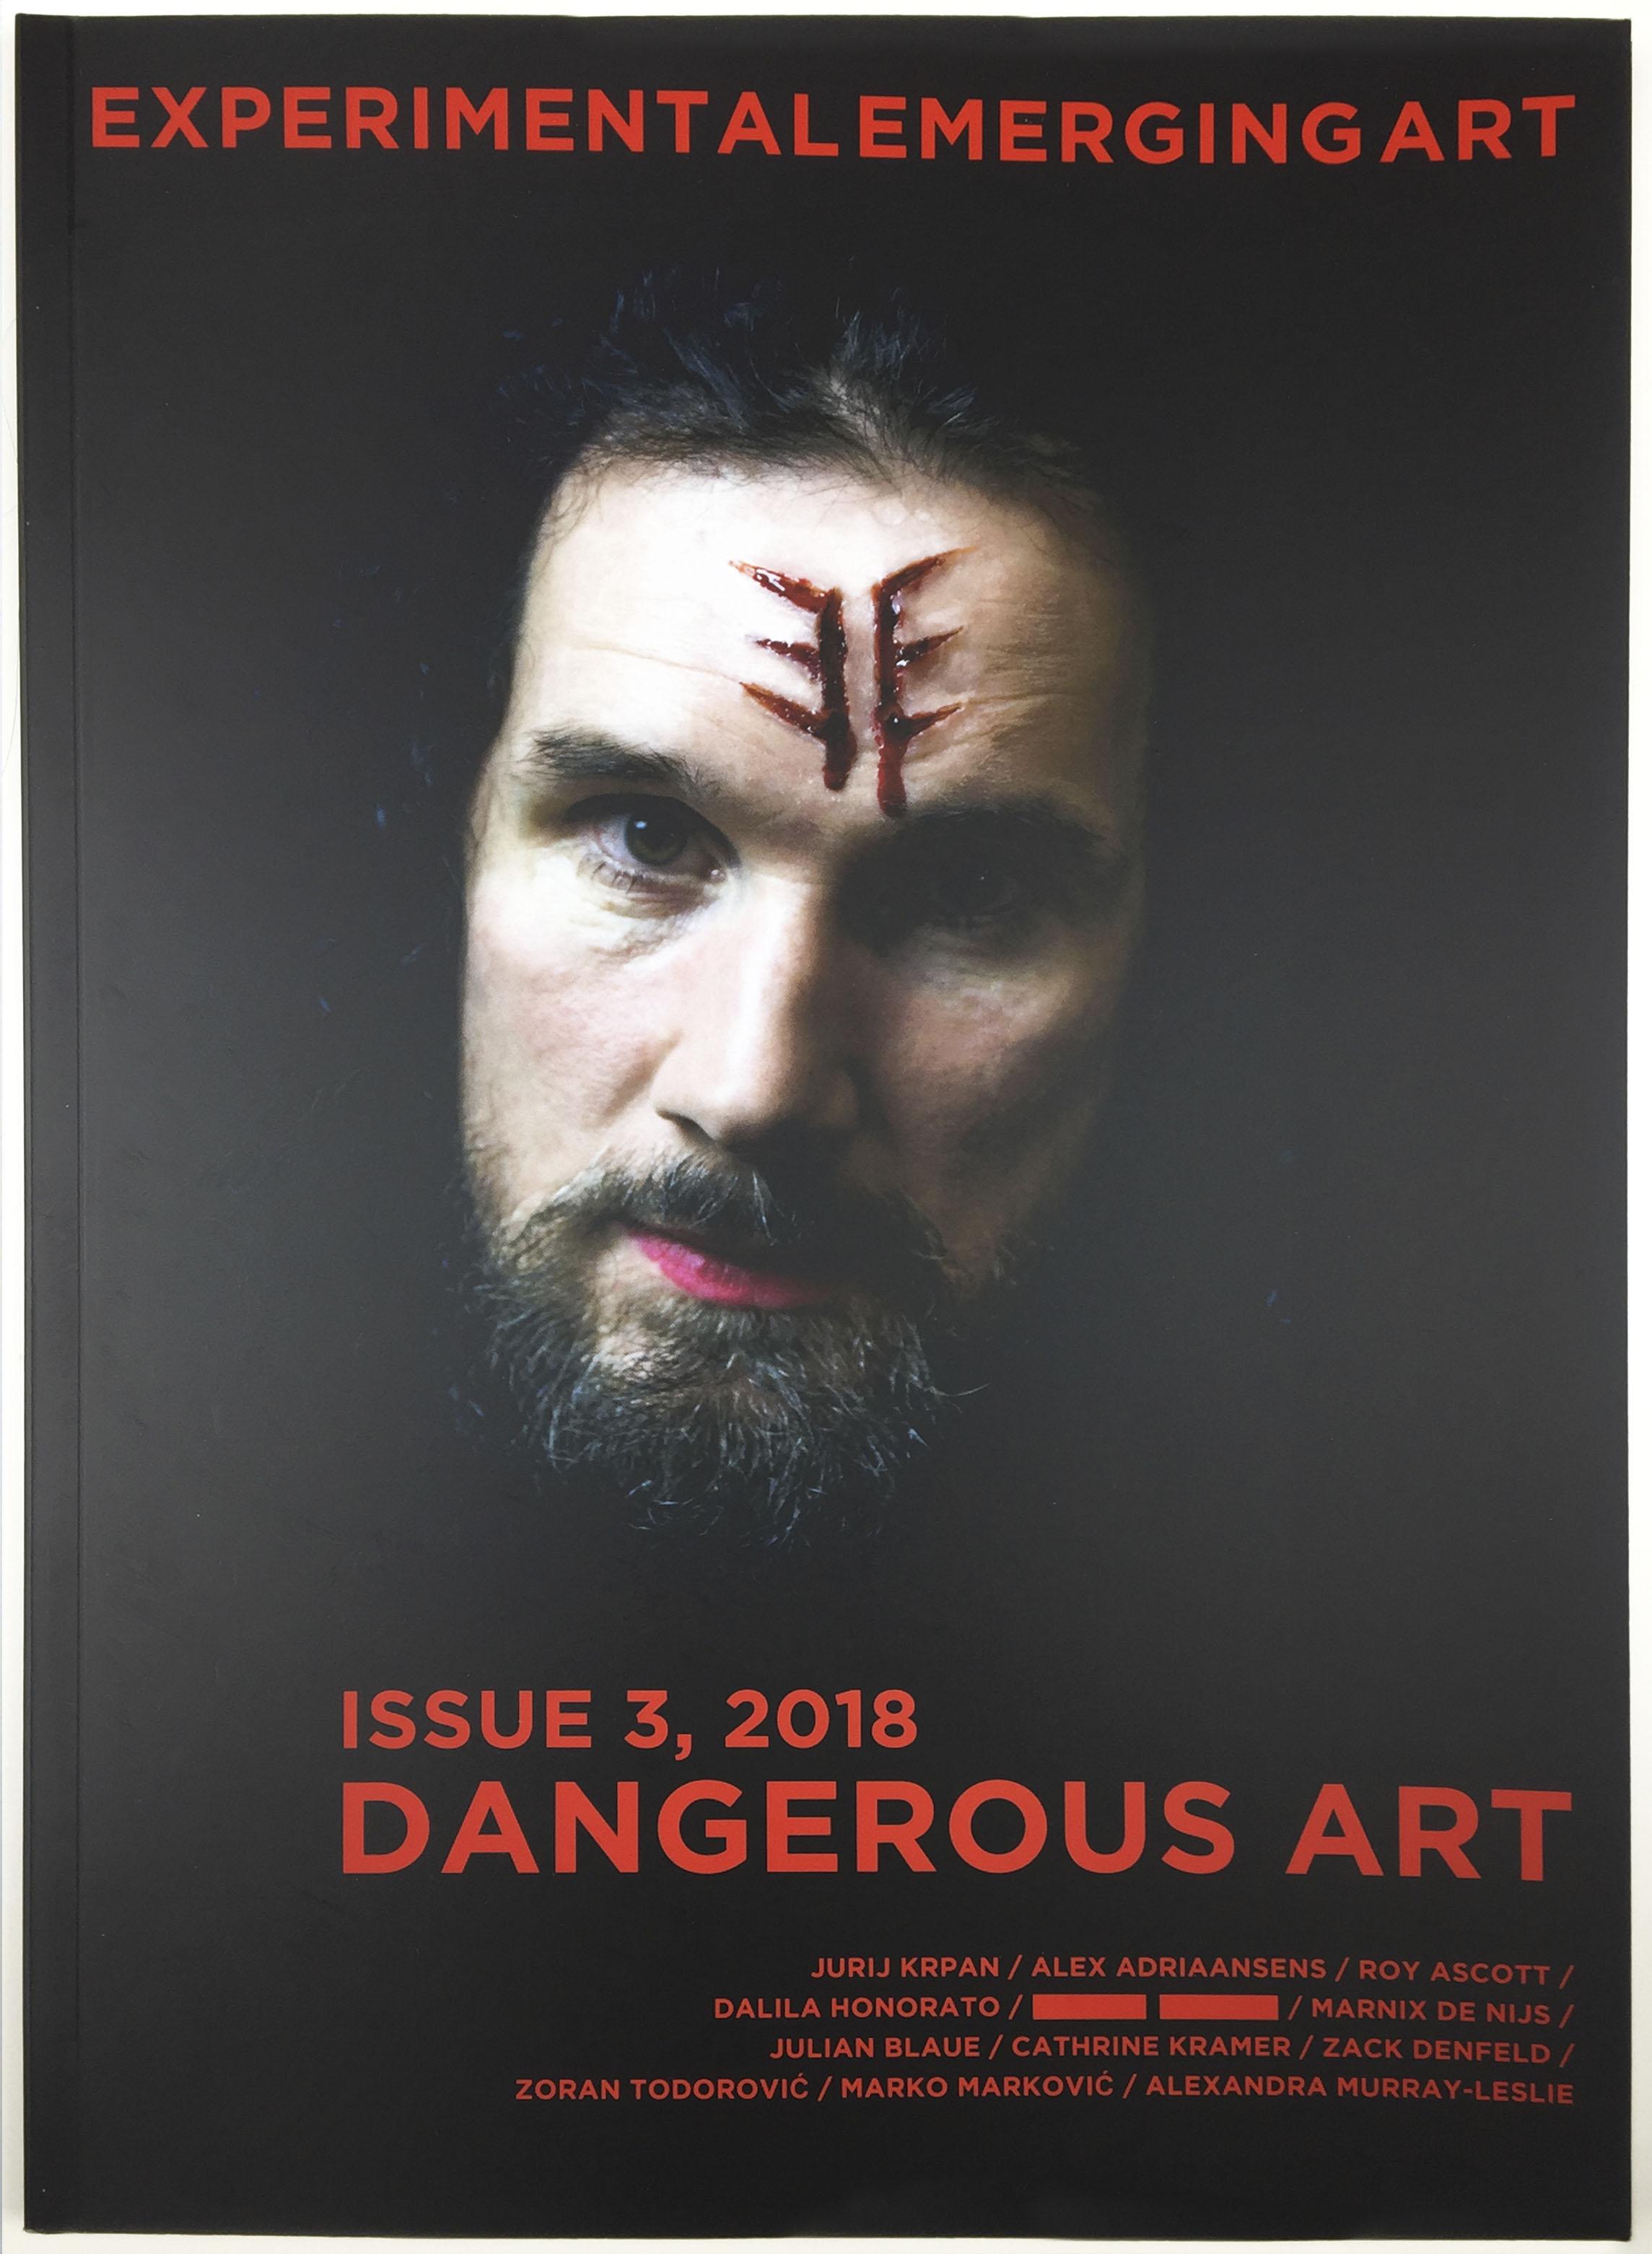 EE Experimental Emerging Art #3 : Dangerous Art  Stahl Stenslie, Zane Cerpina (eds.). TEKS Publishing, 2018. ISSN: 2464-448X  eejournal.no